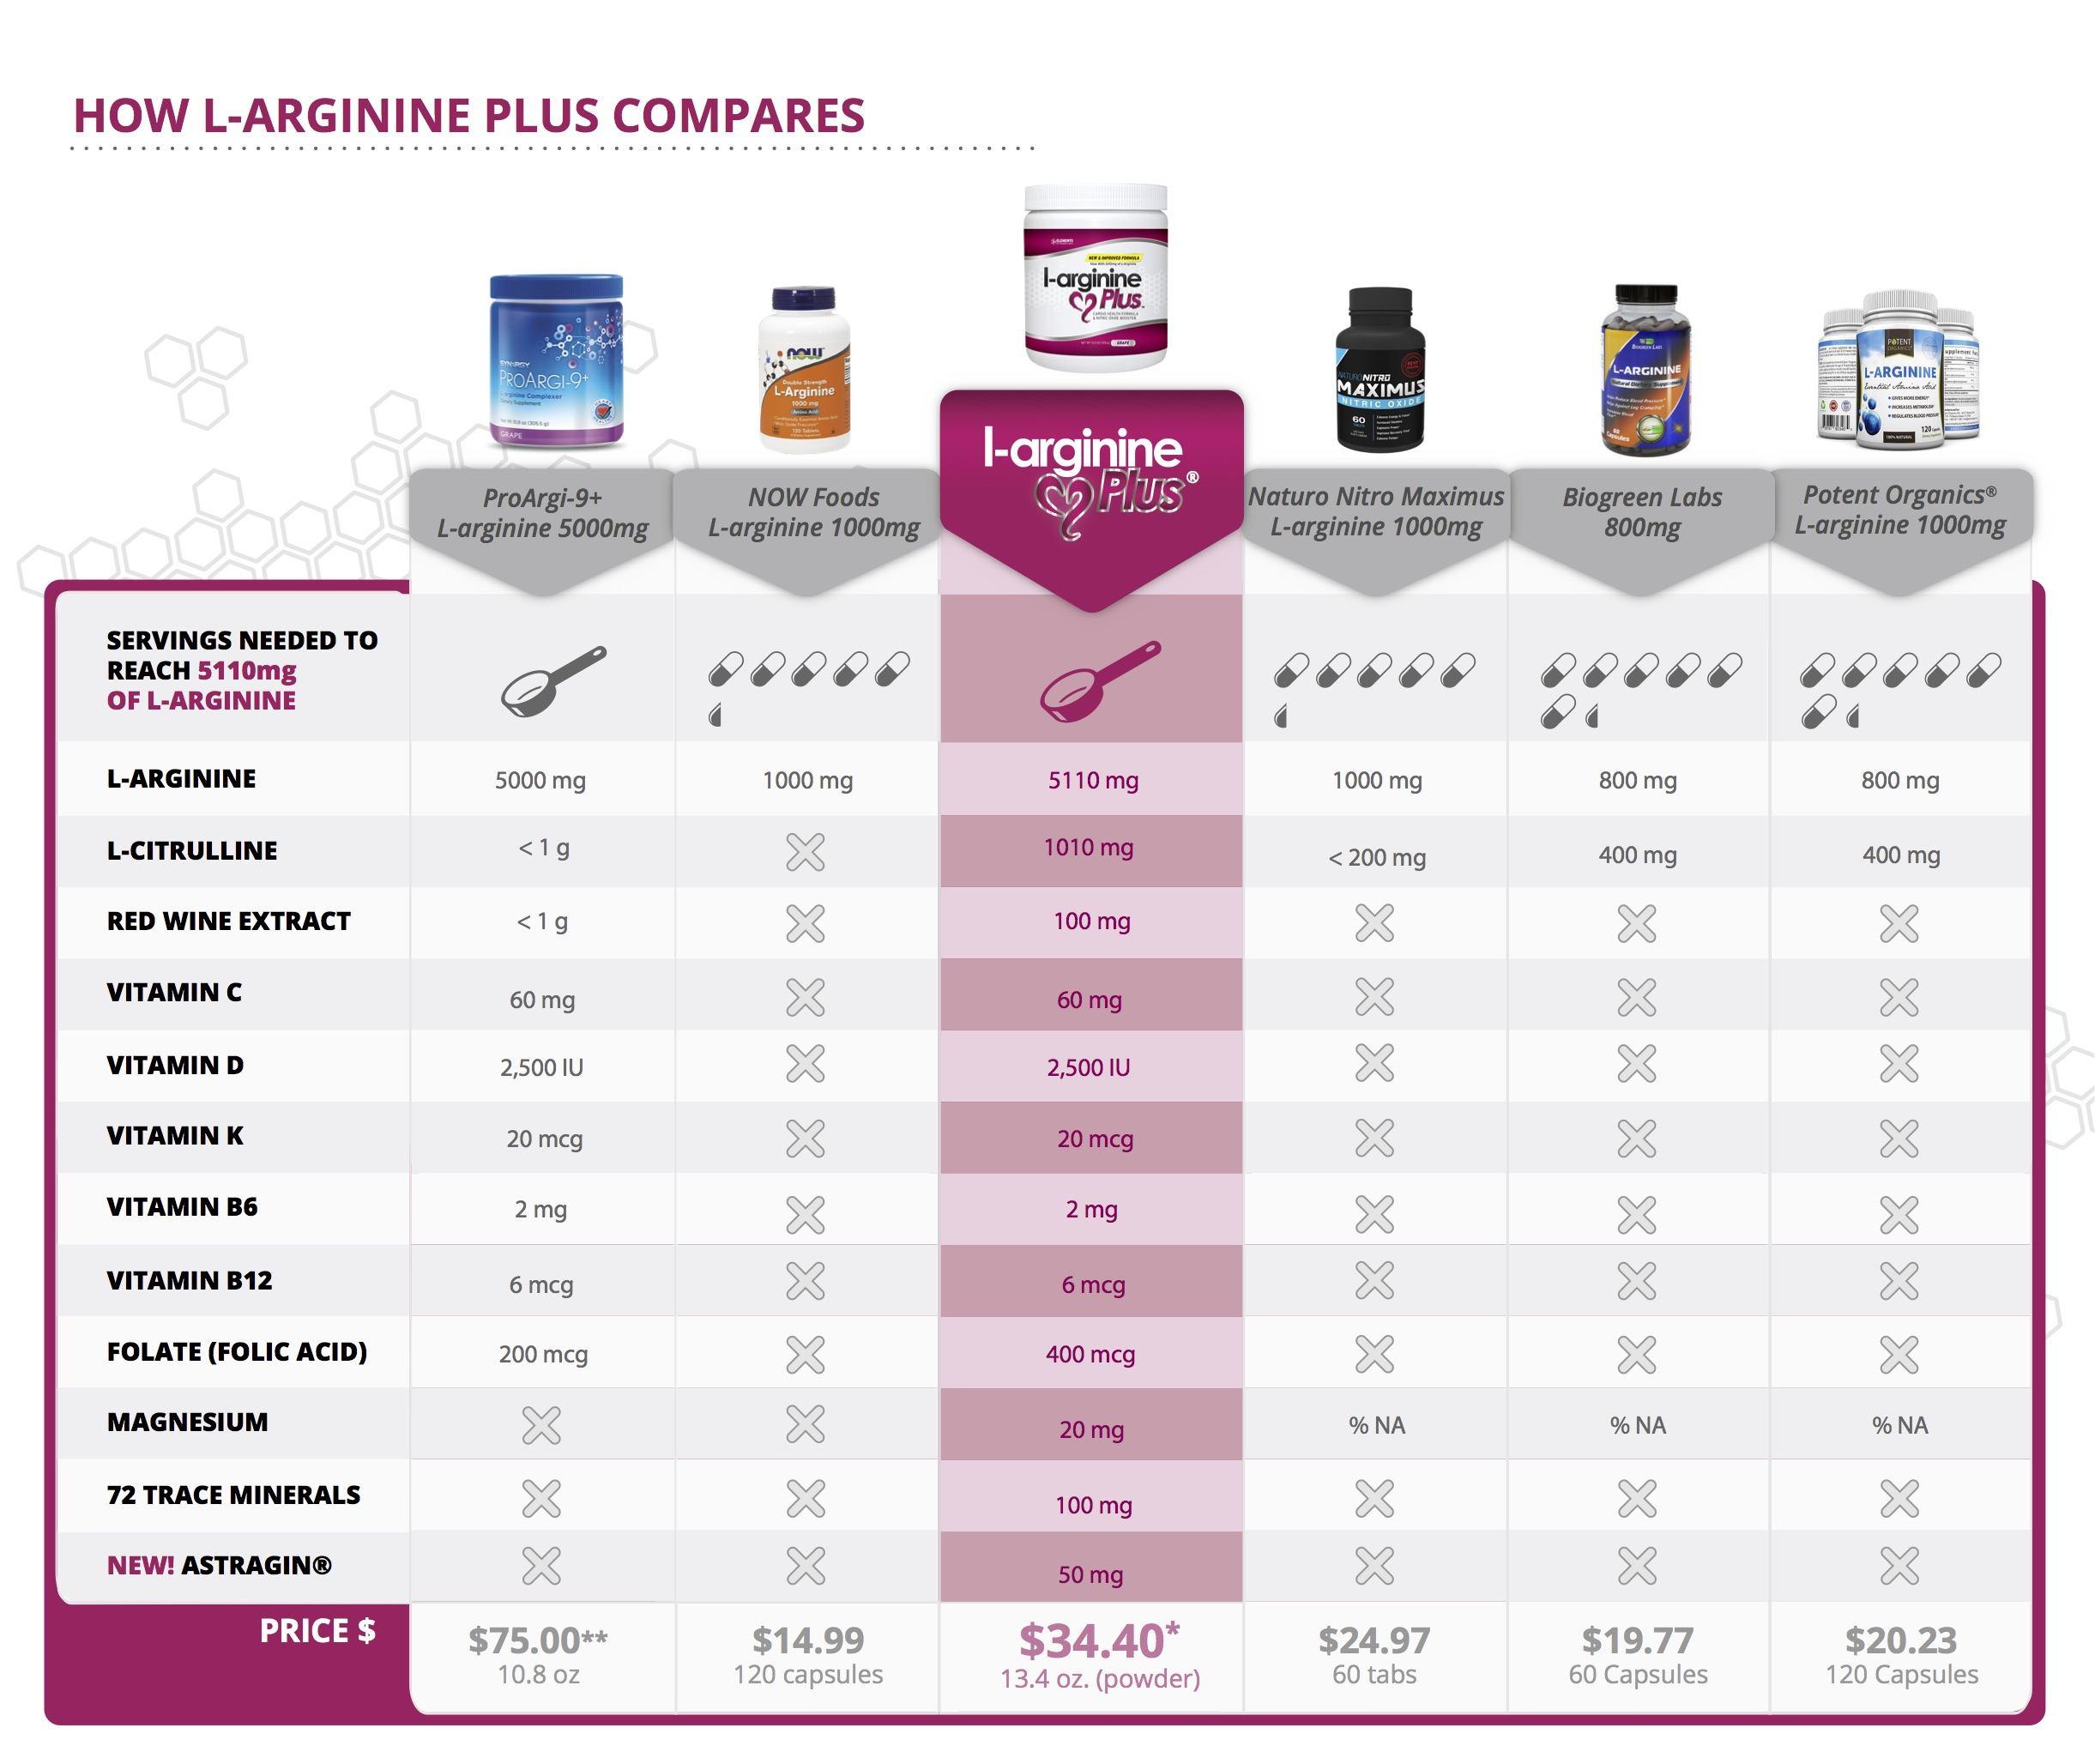 why l-arginine plus is the best choice